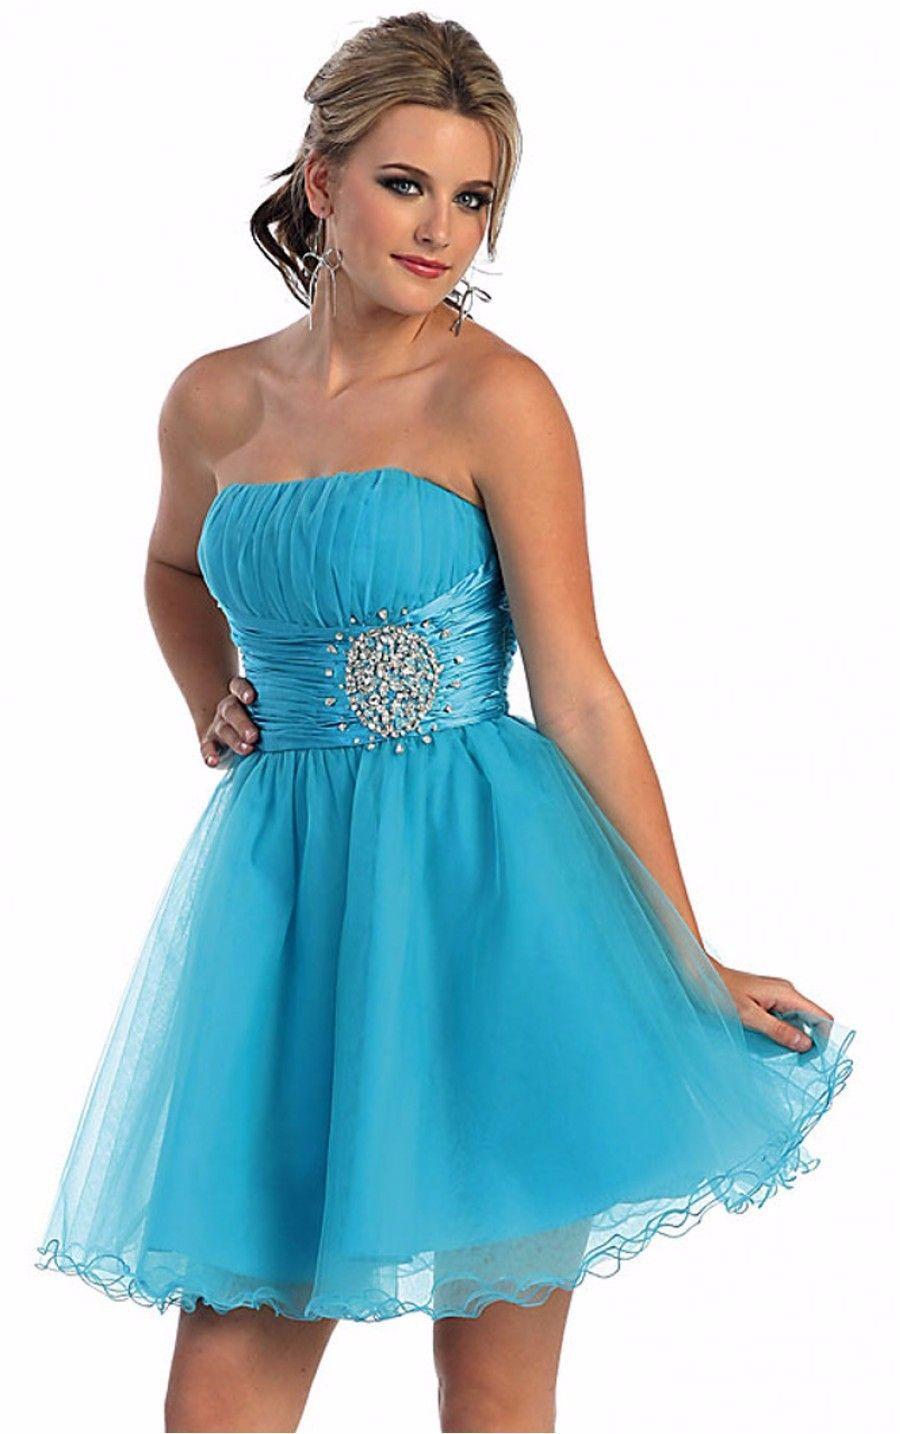 Malibu Blue Short Party Dress Short Bridesmaid Dress Prom Dress with Beading Free Shipping